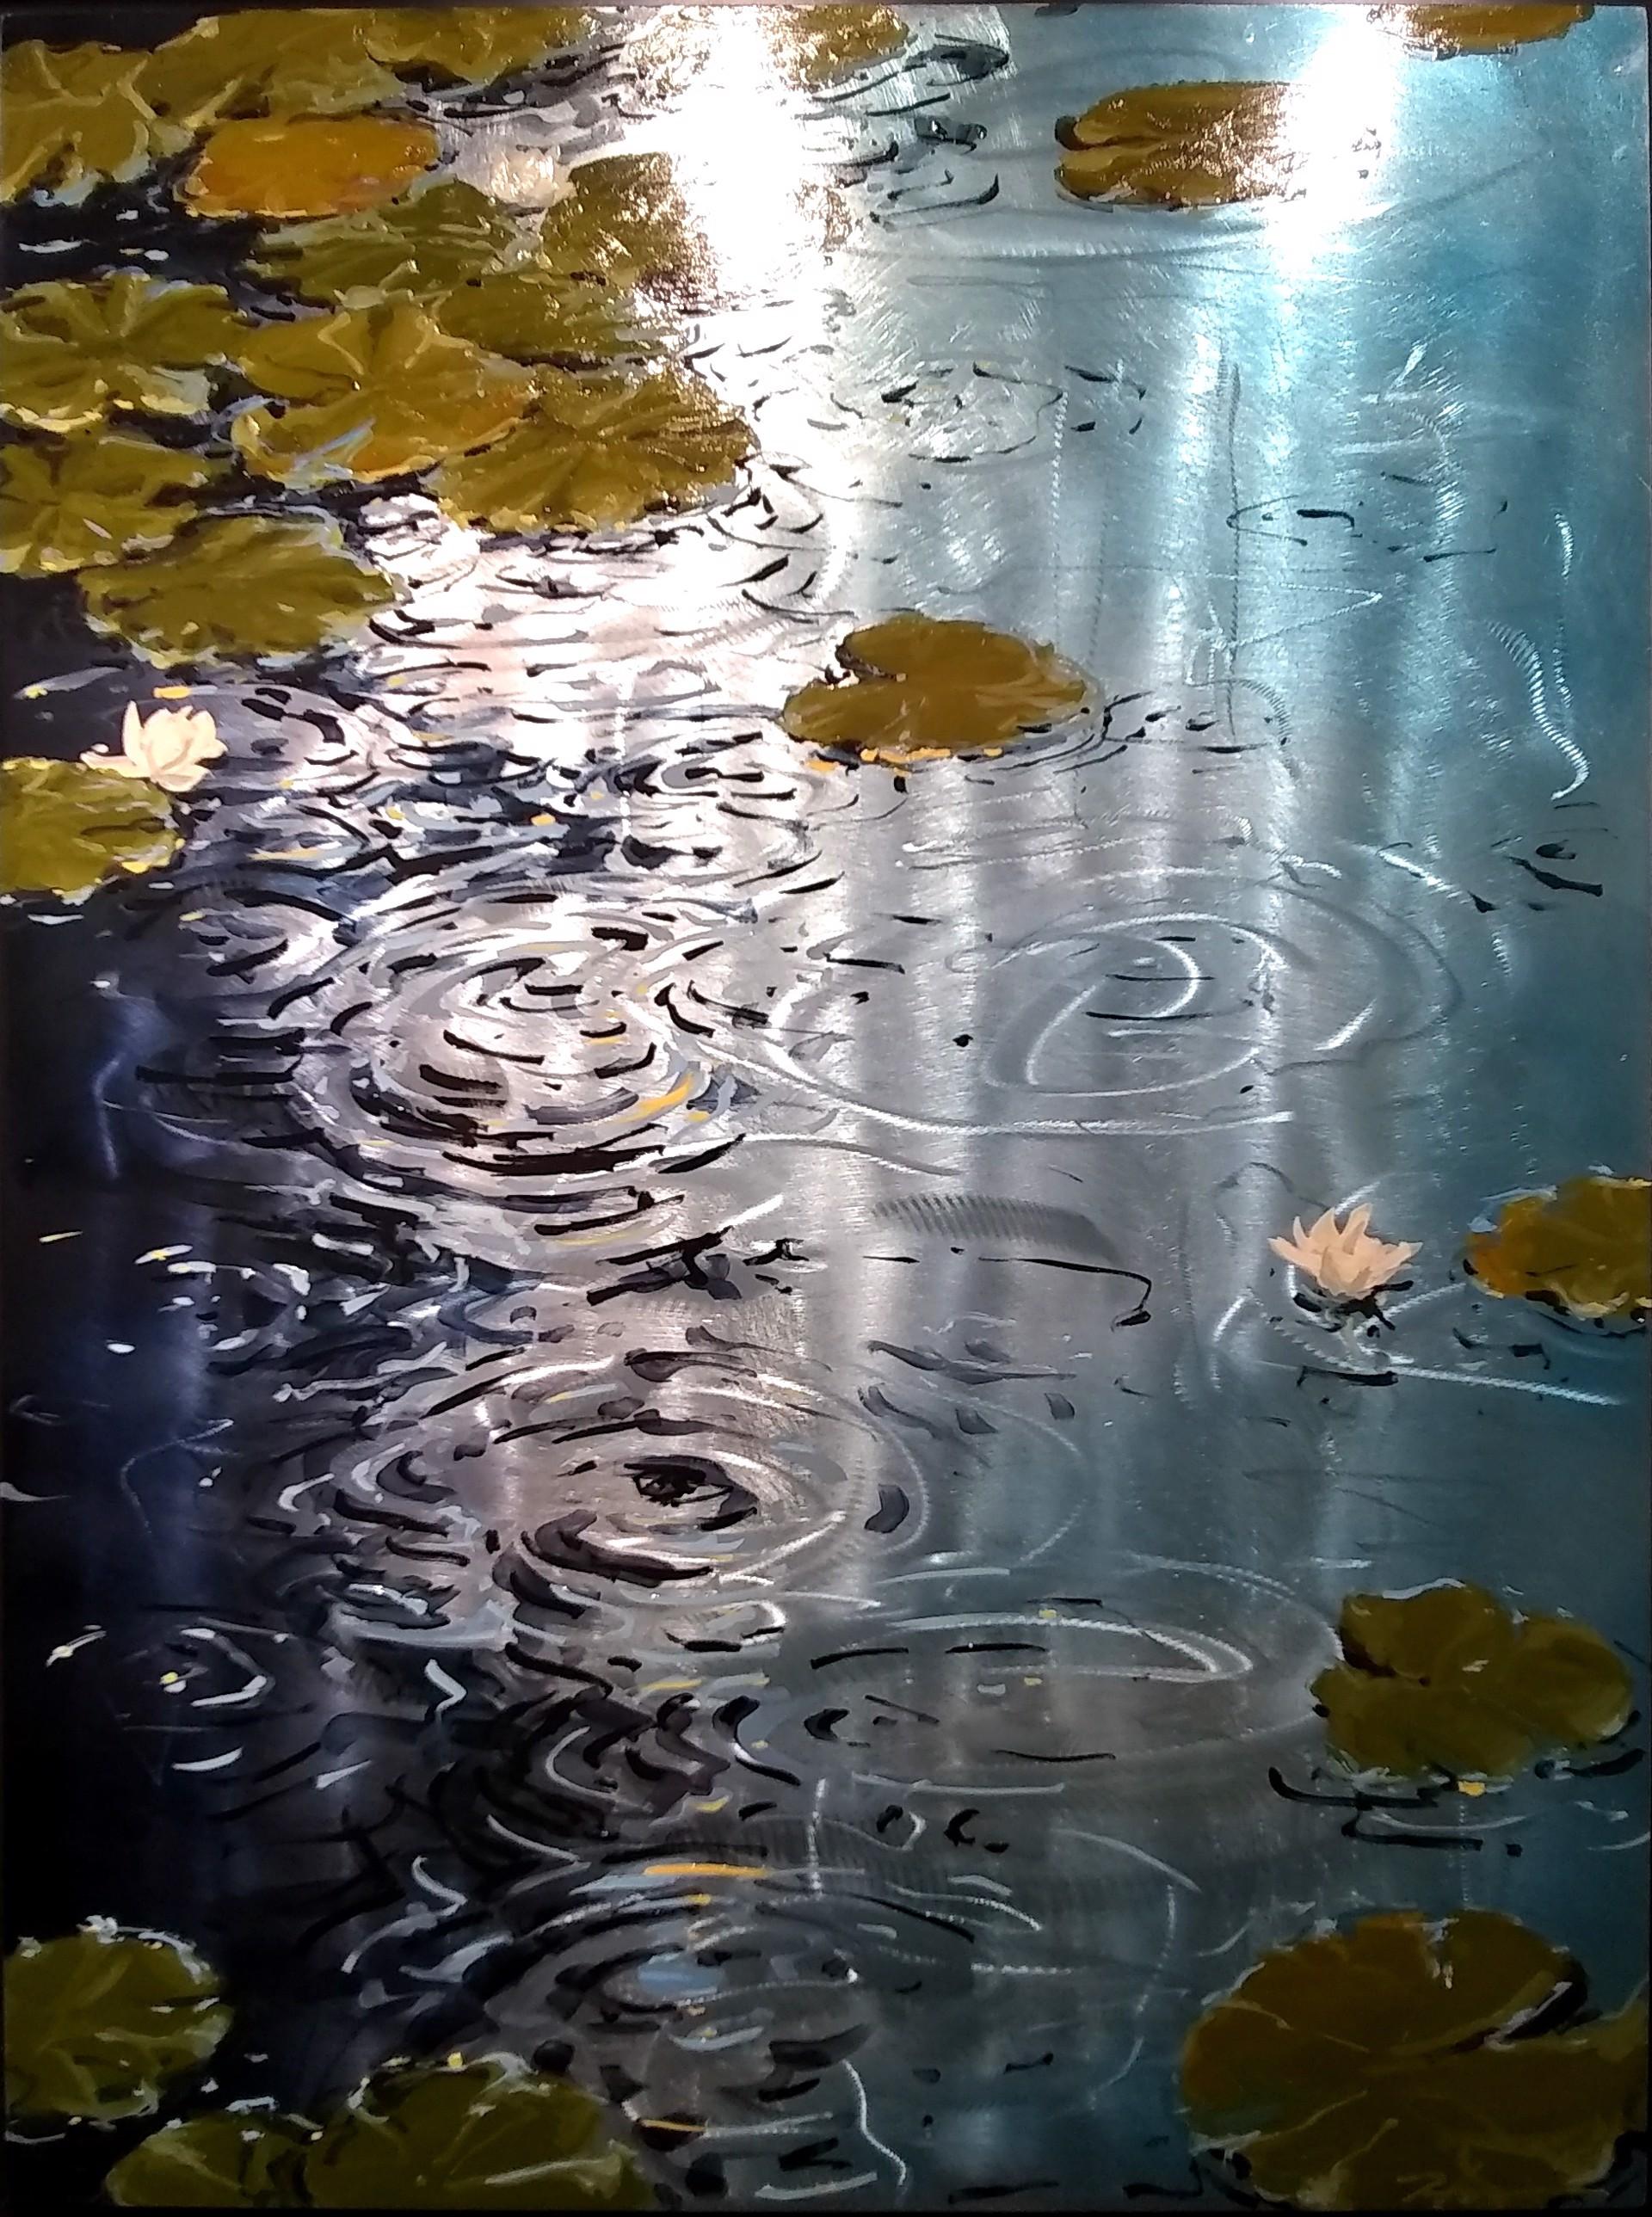 Dodging Raindrops by Scott Harris